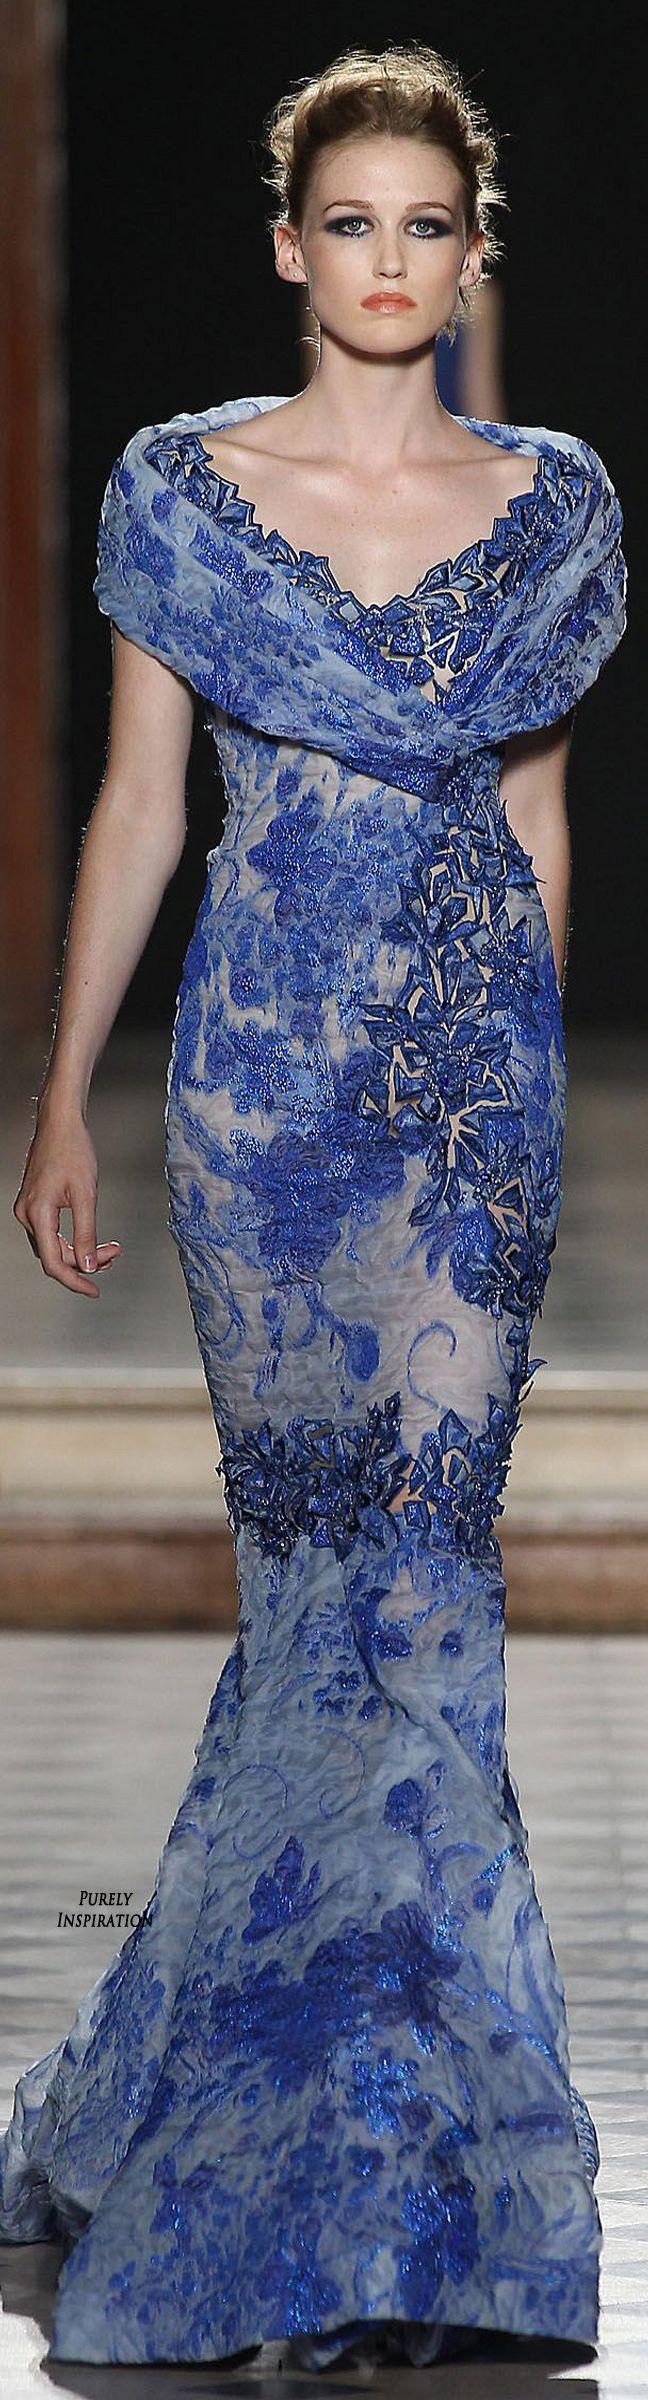 Tony Ward Fall 2015 Haute Couture | Purely Inspiration jαɢlαdy